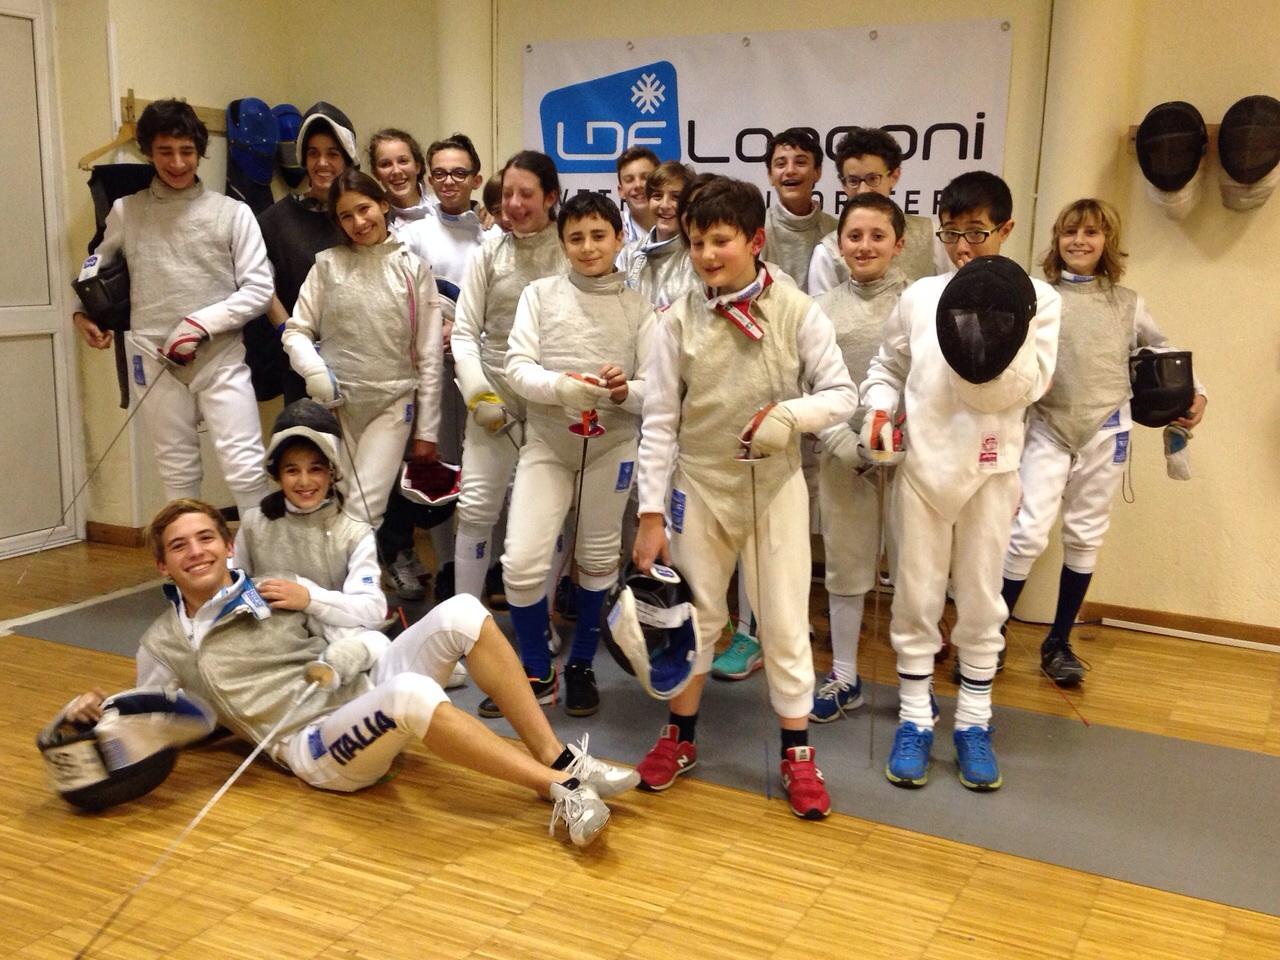 un gruppo di atleti di Scherma Monza ASD